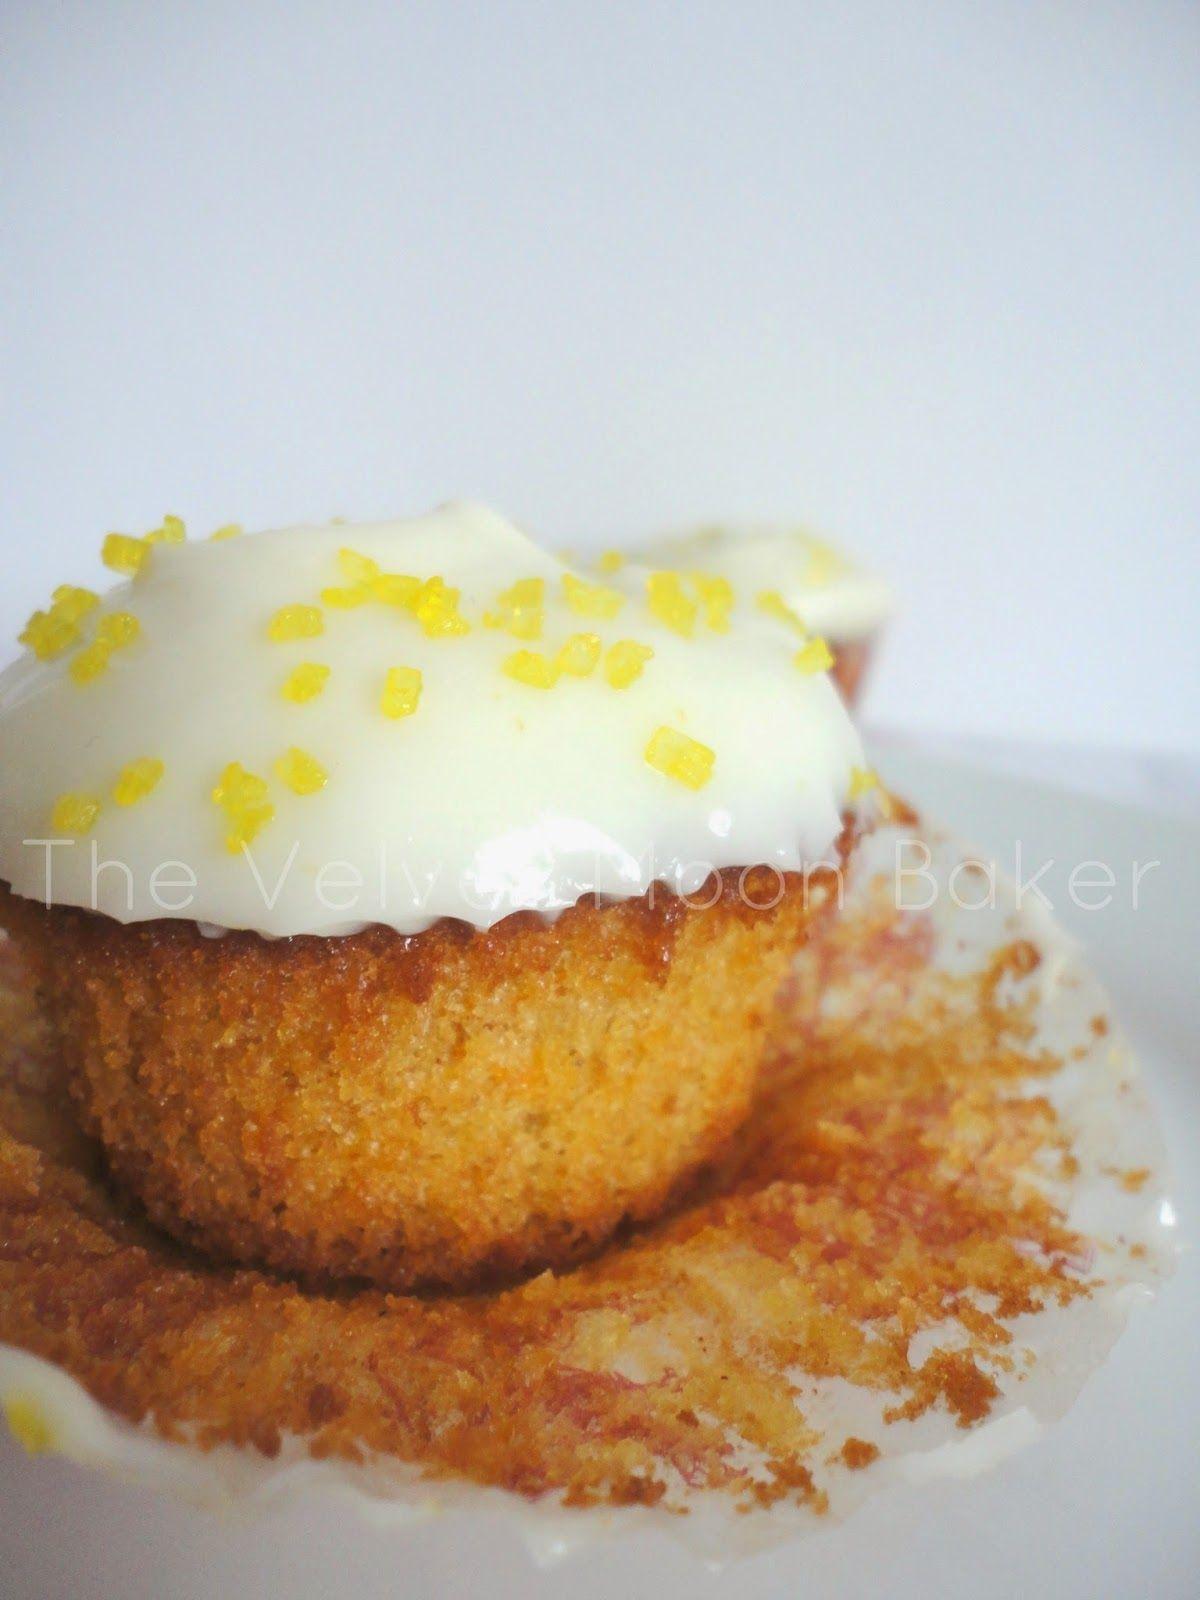 Carrot Cake Cupcakes with Orange Mascarpone Frosting